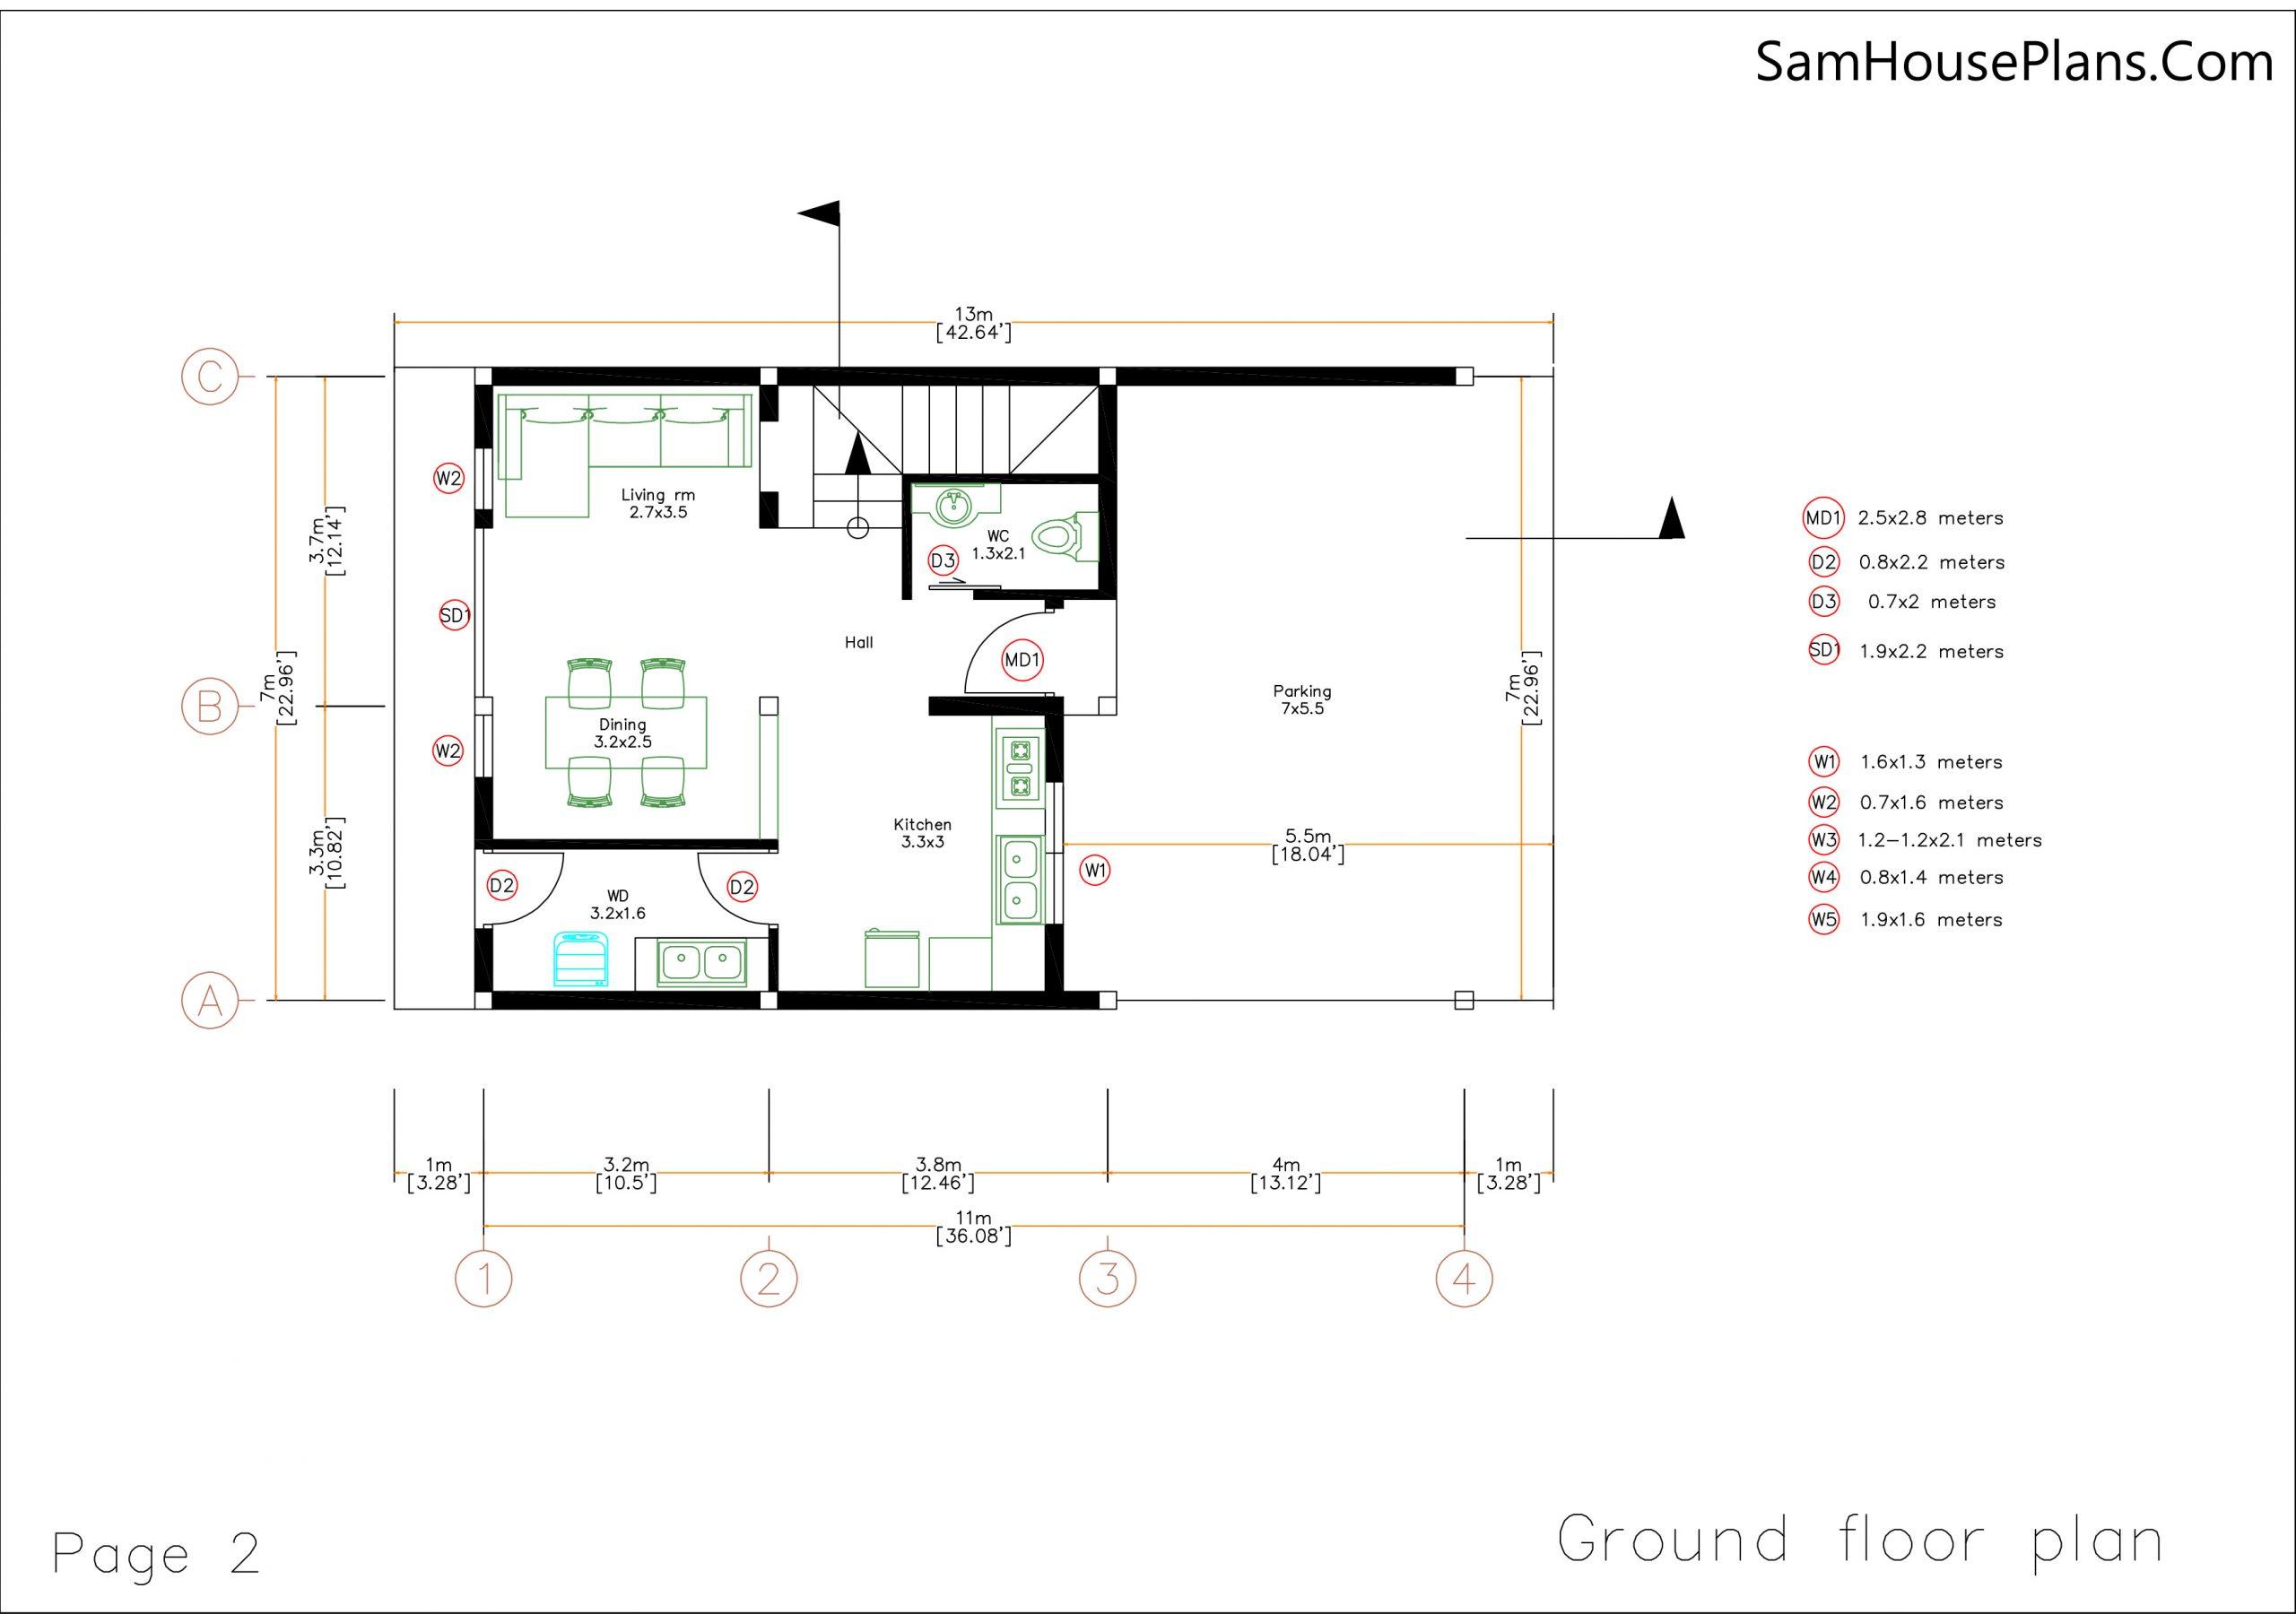 02 Ground floor plan House design Plan 7x13m with 3 Bedrooms